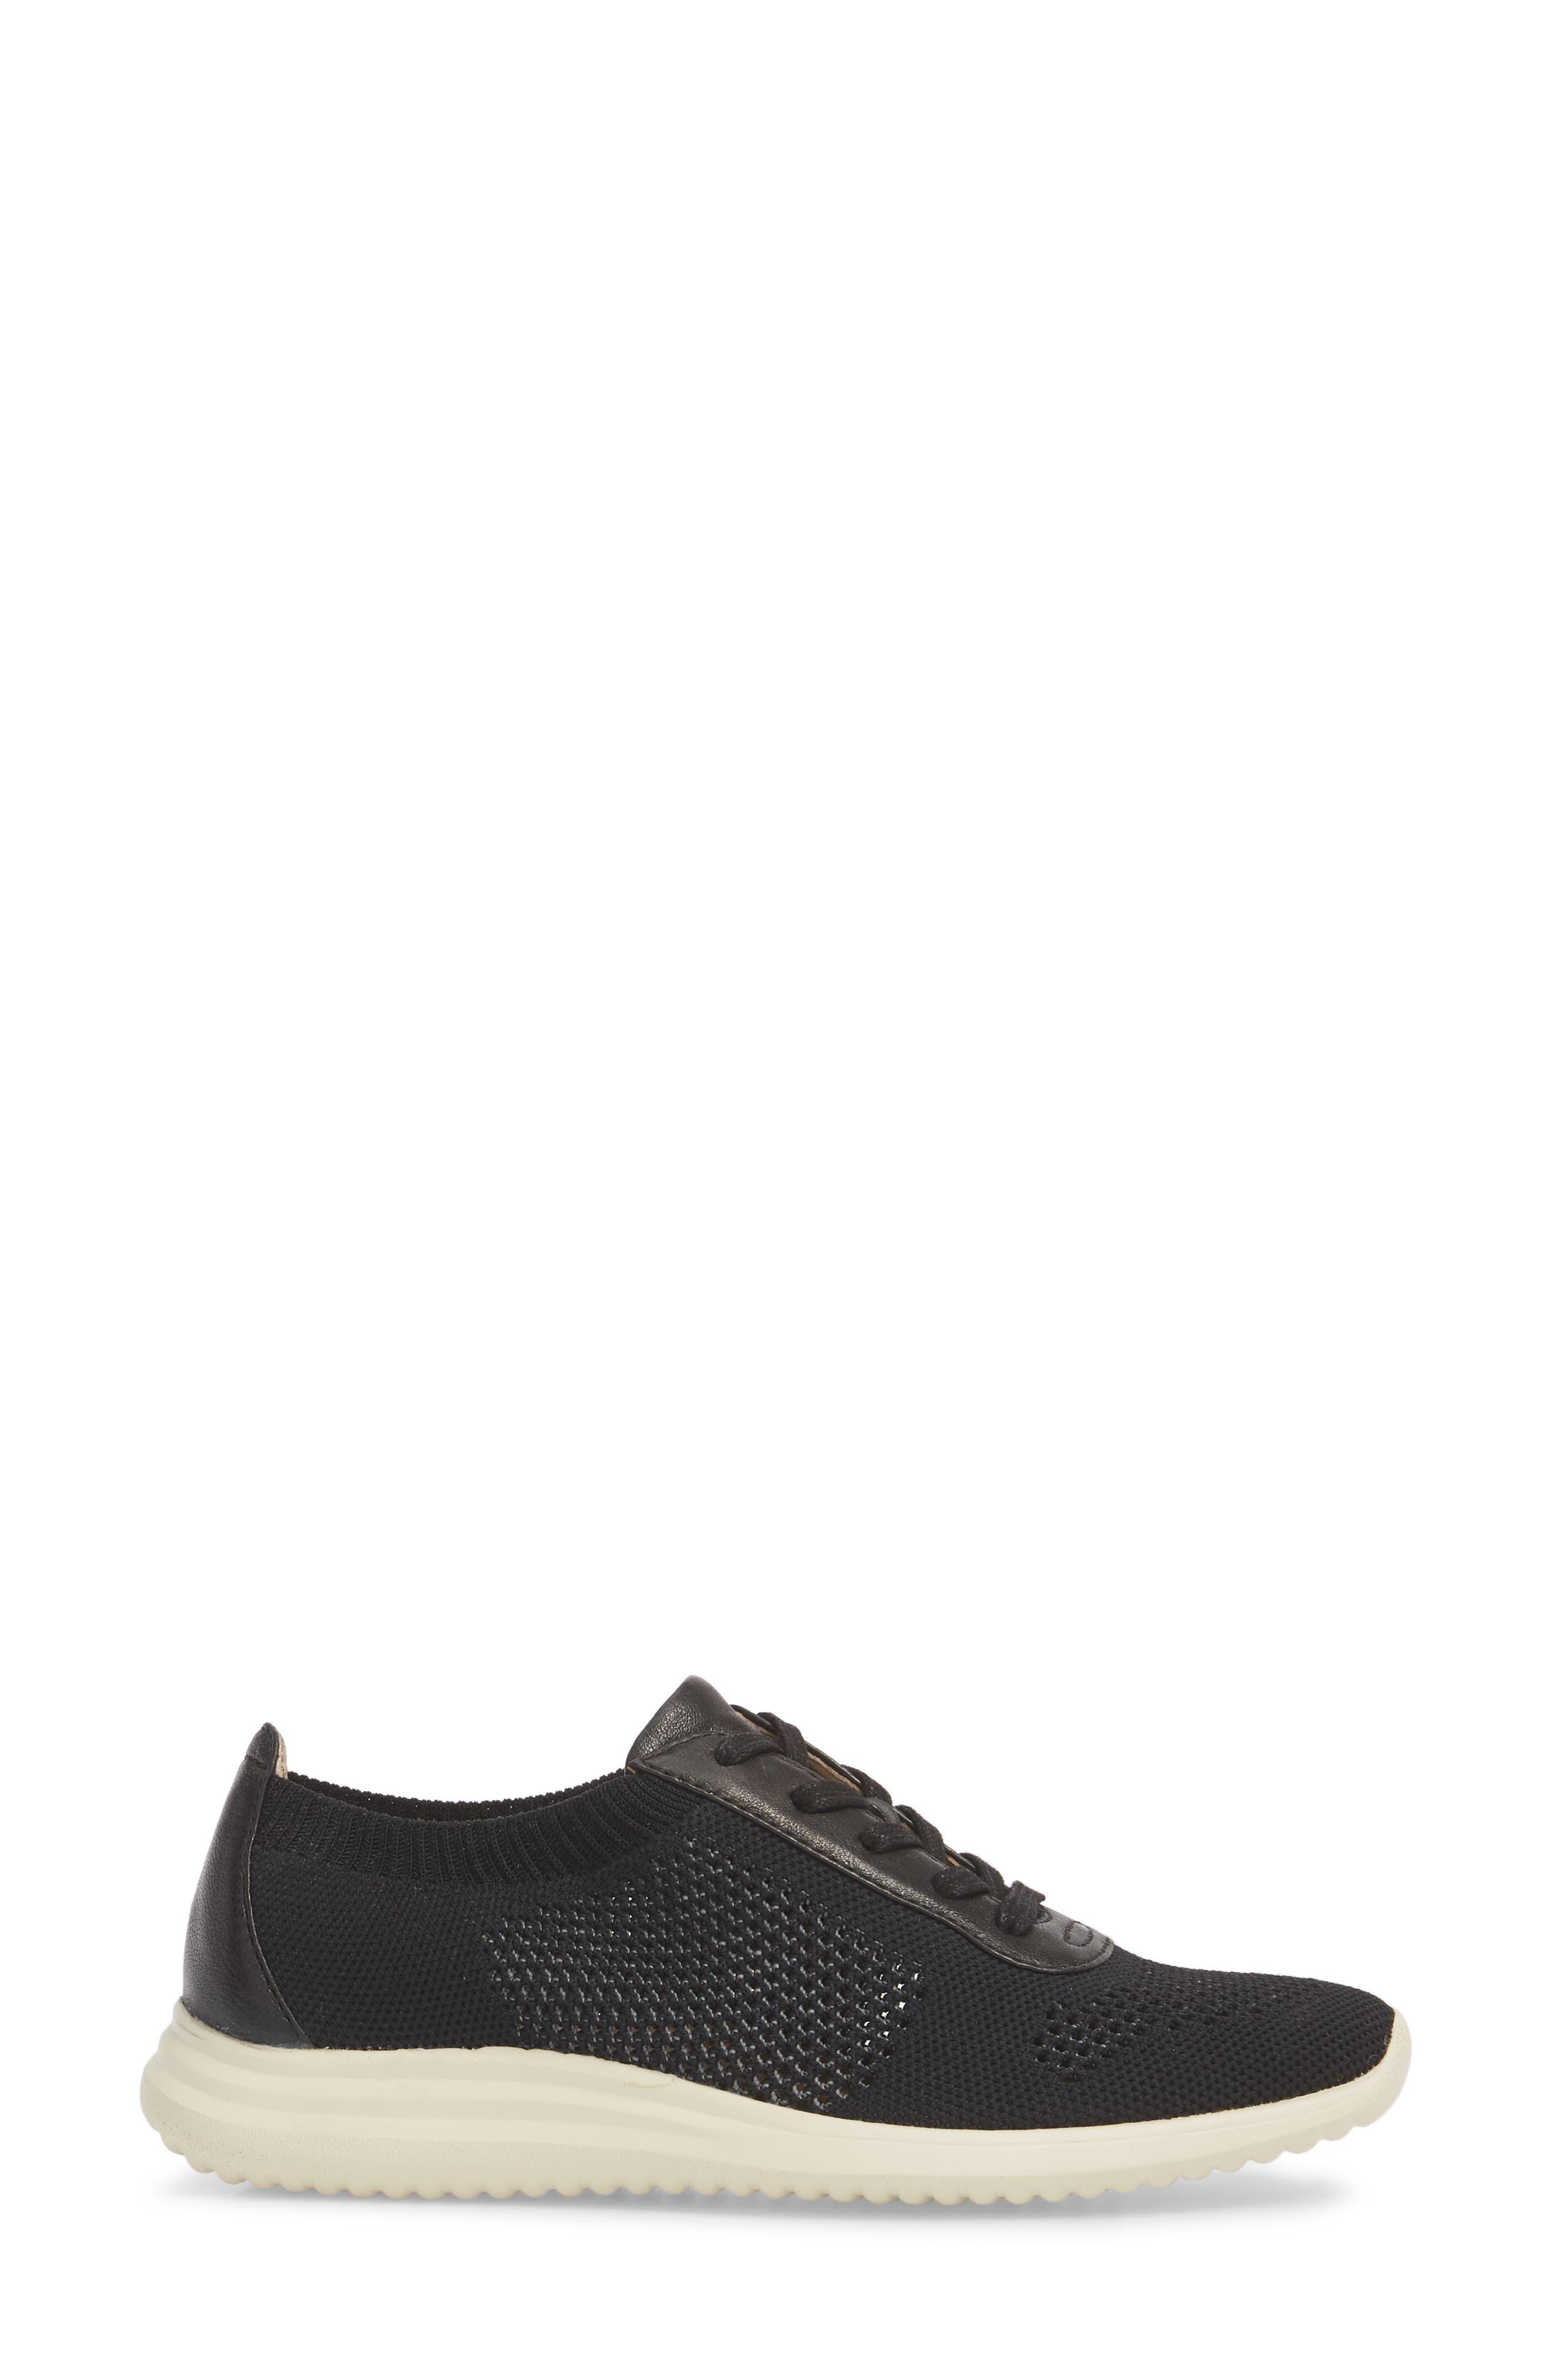 Novella Sneaker,                             Alternate thumbnail 3, color,                             Black Fabric